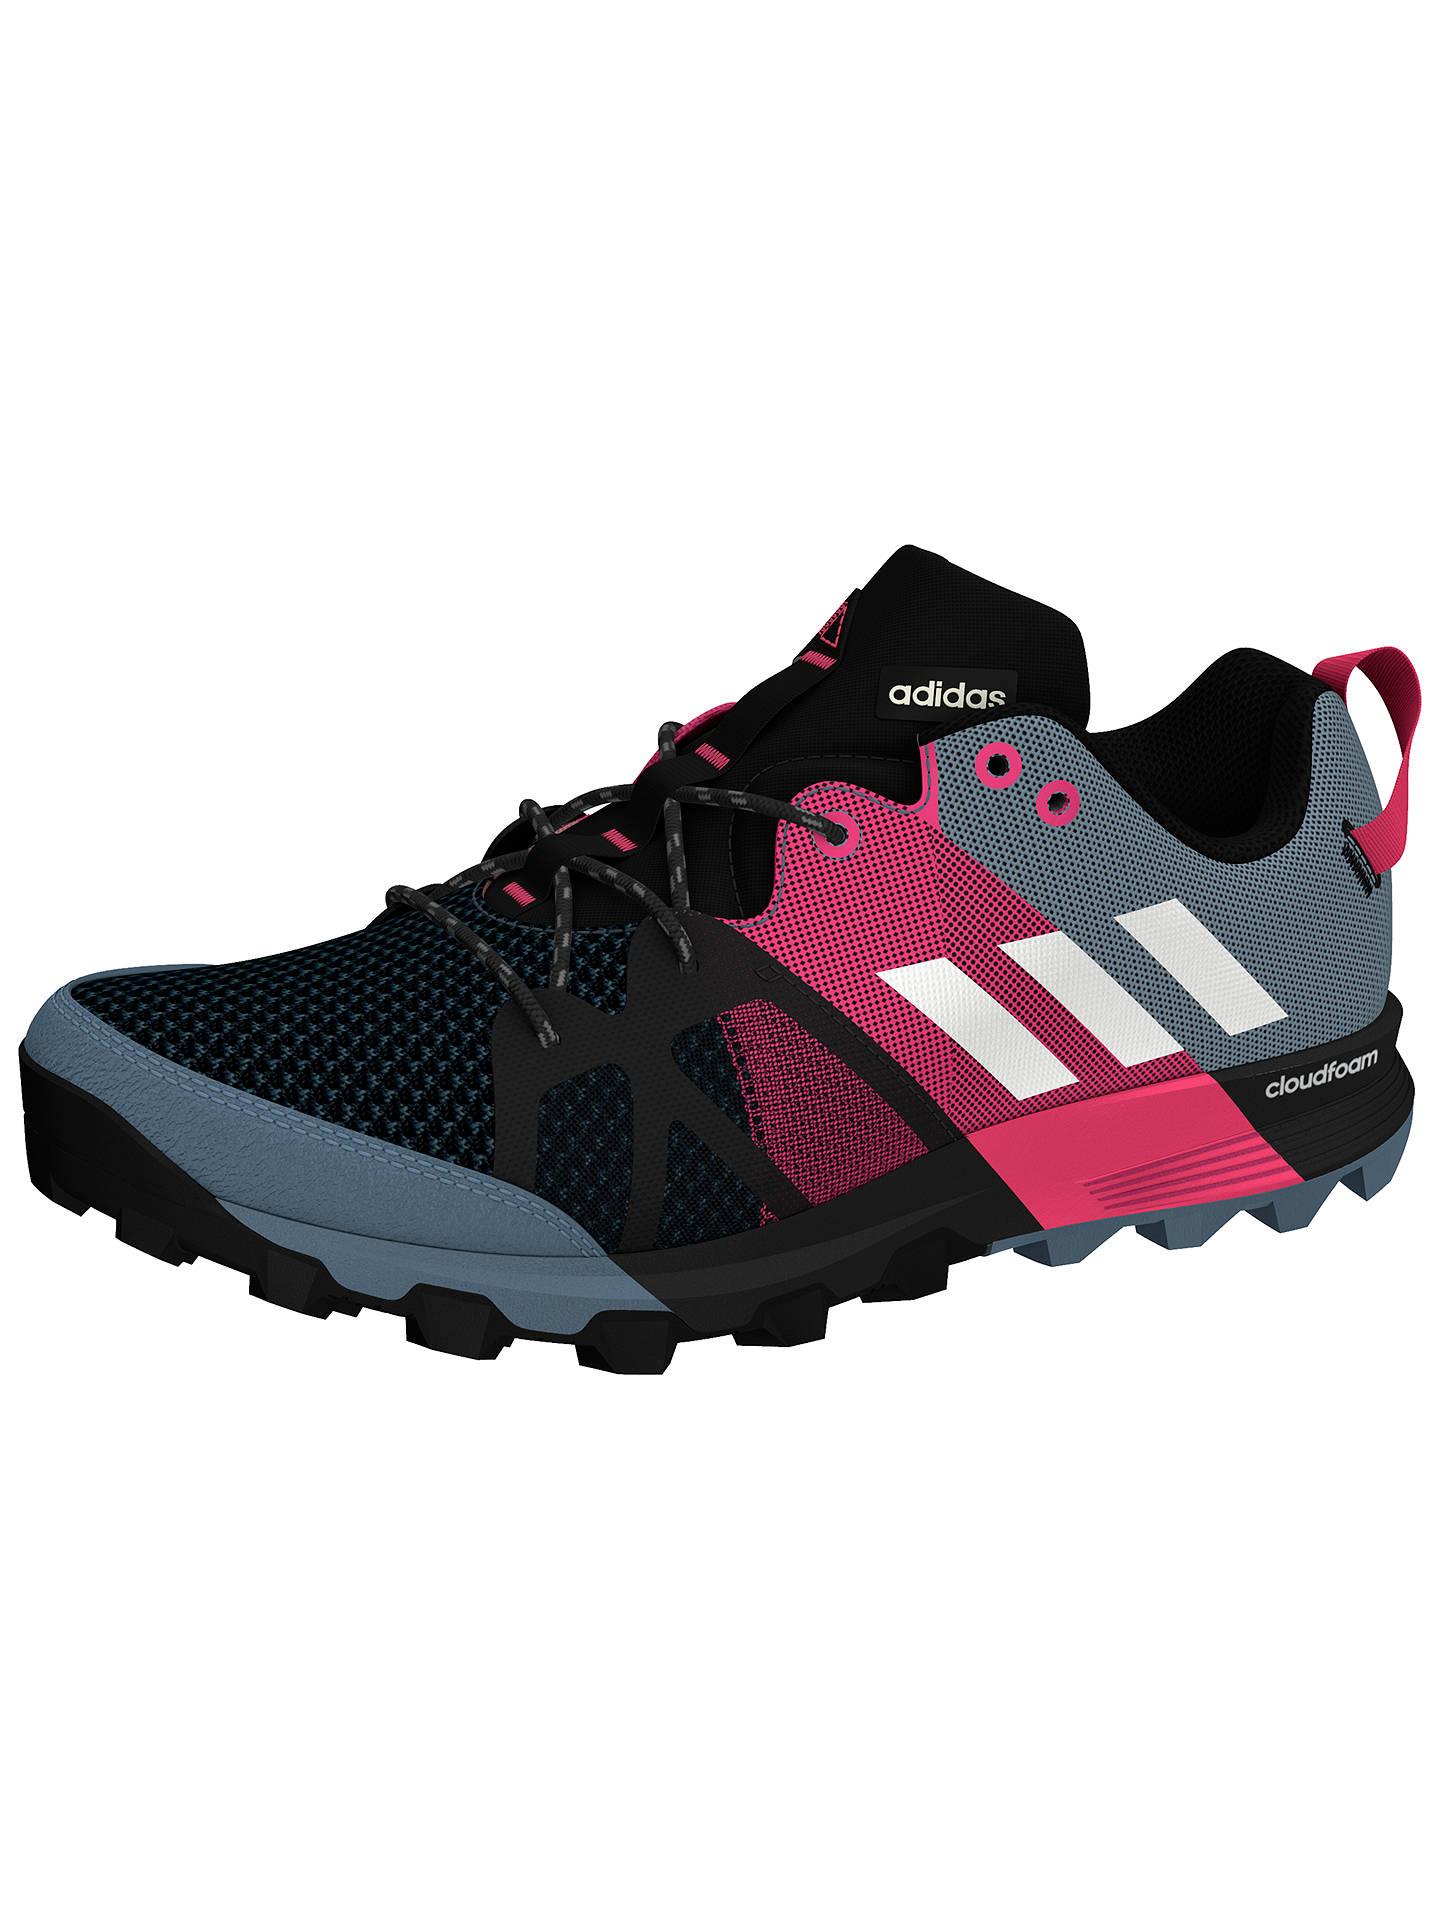 93bcdad2eac522 ... Buyadidas Kanadia 8.1 Trail Women s Running Shoes